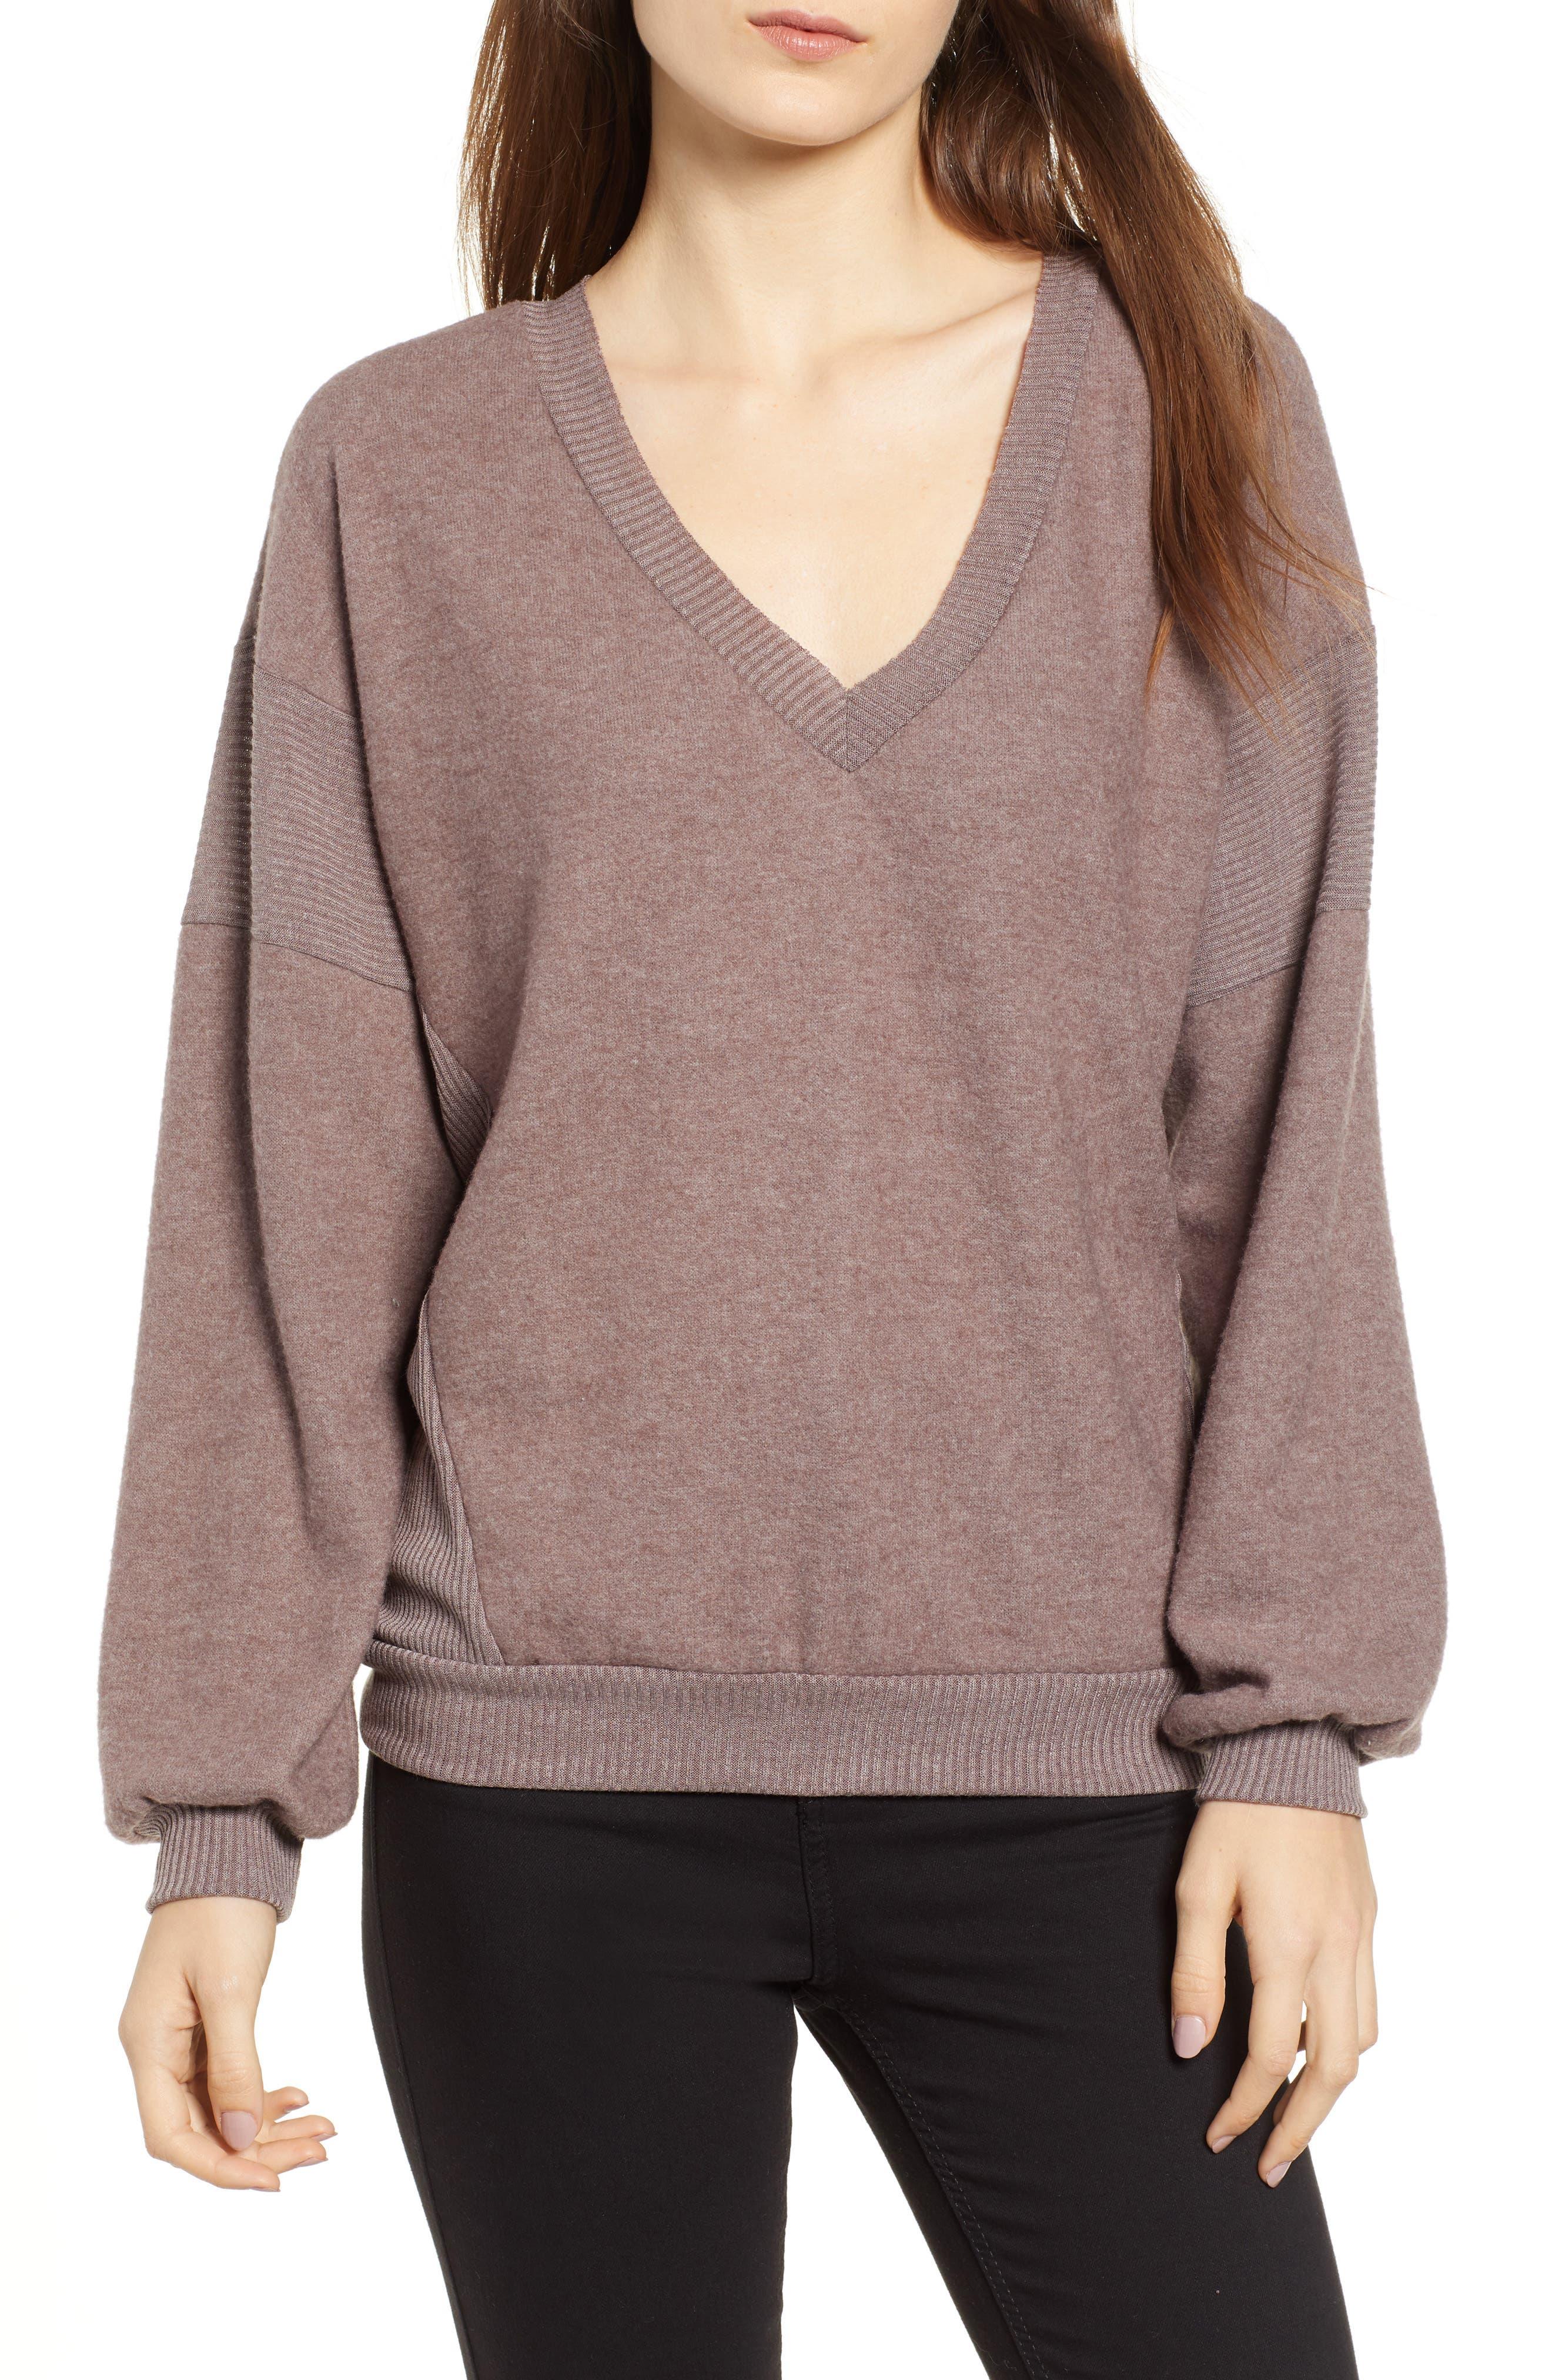 Alsen V-Neck Sweatshirt,                             Main thumbnail 1, color,                             250